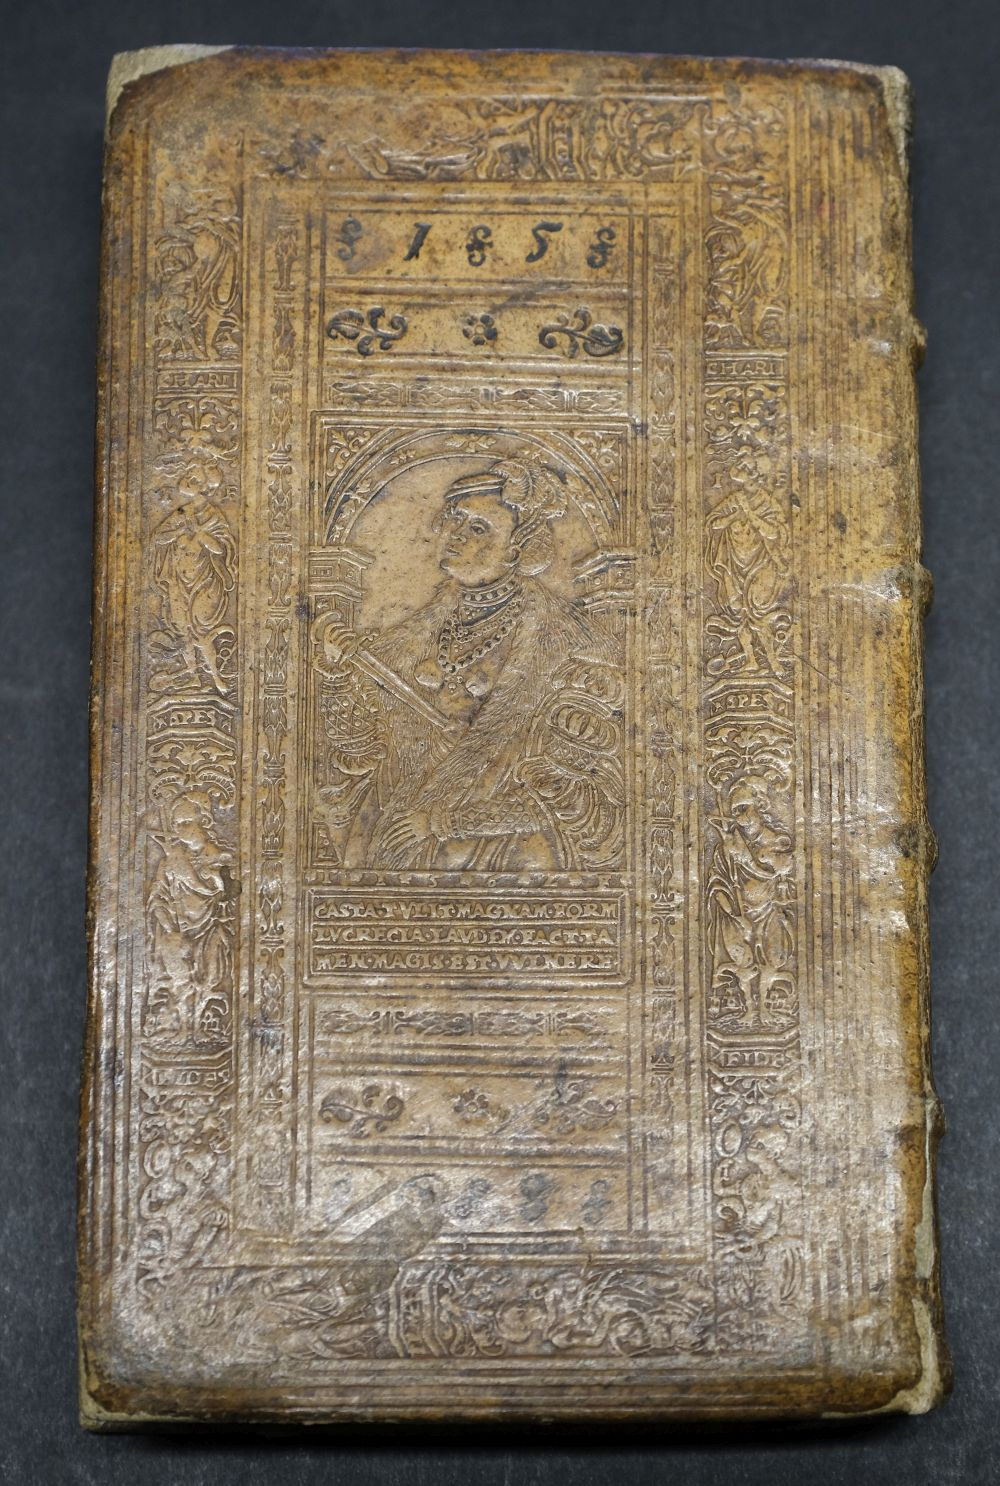 Sambucus (Joannes). Emblemata, Antwerp: Christopher Plantin, 1564 - Image 5 of 11